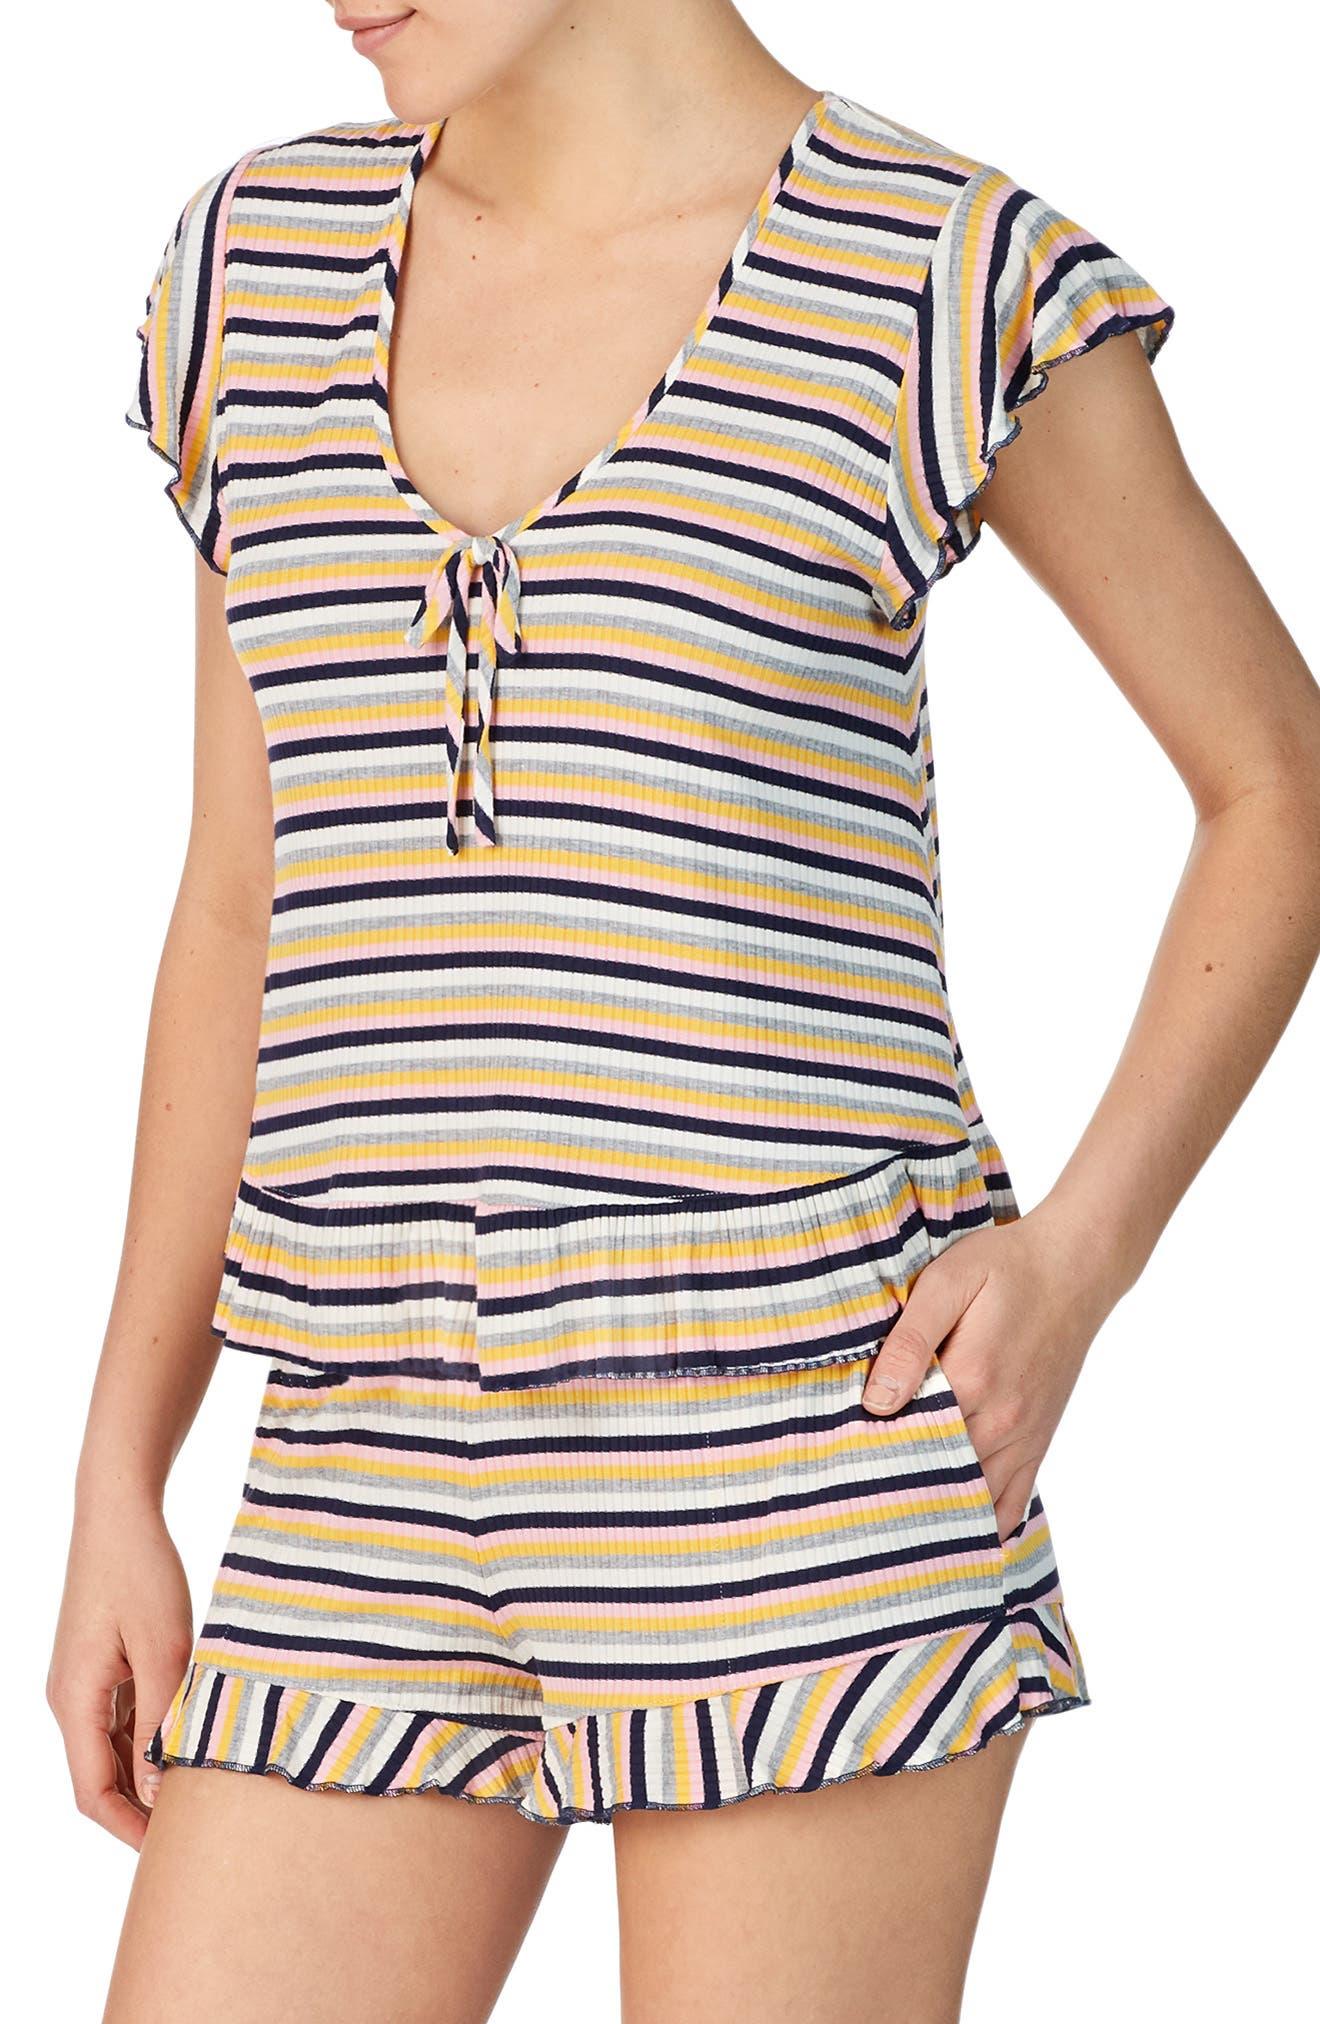 Room Service Ruffle Short Pajamas, Pink (Nordstrom Exclusive)